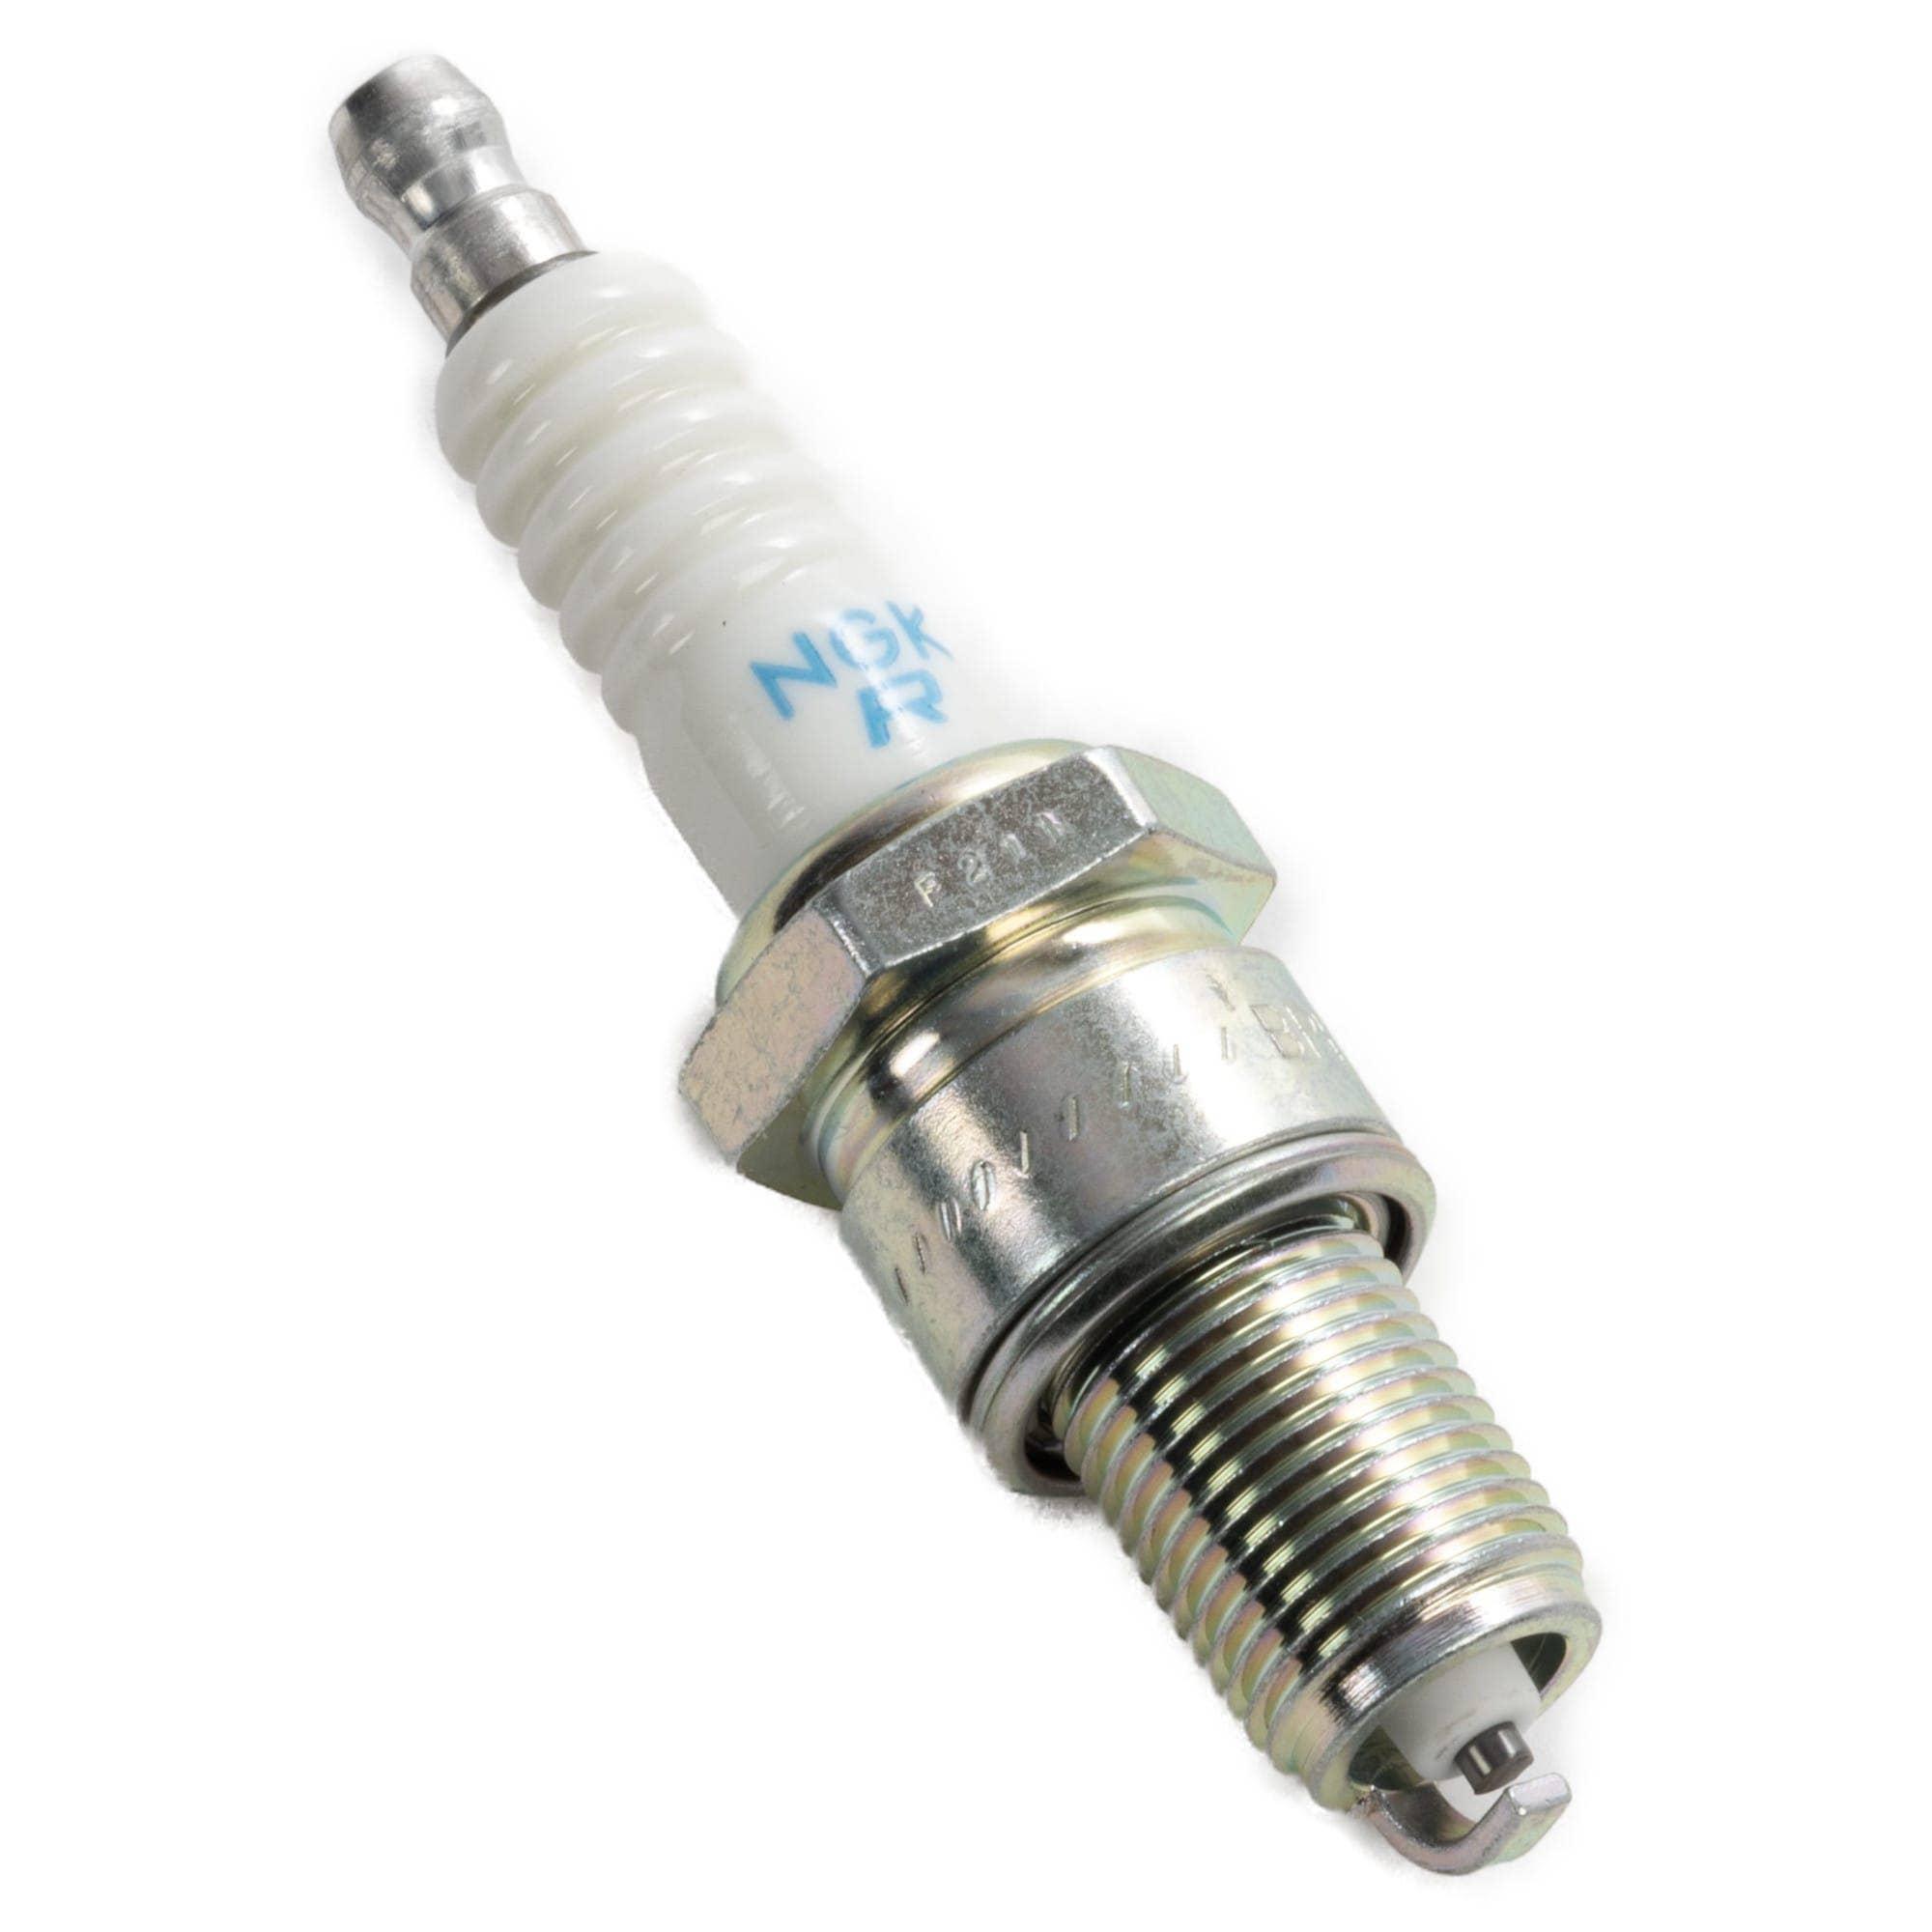 052 627 Spark Plug Ngk Moss Motors